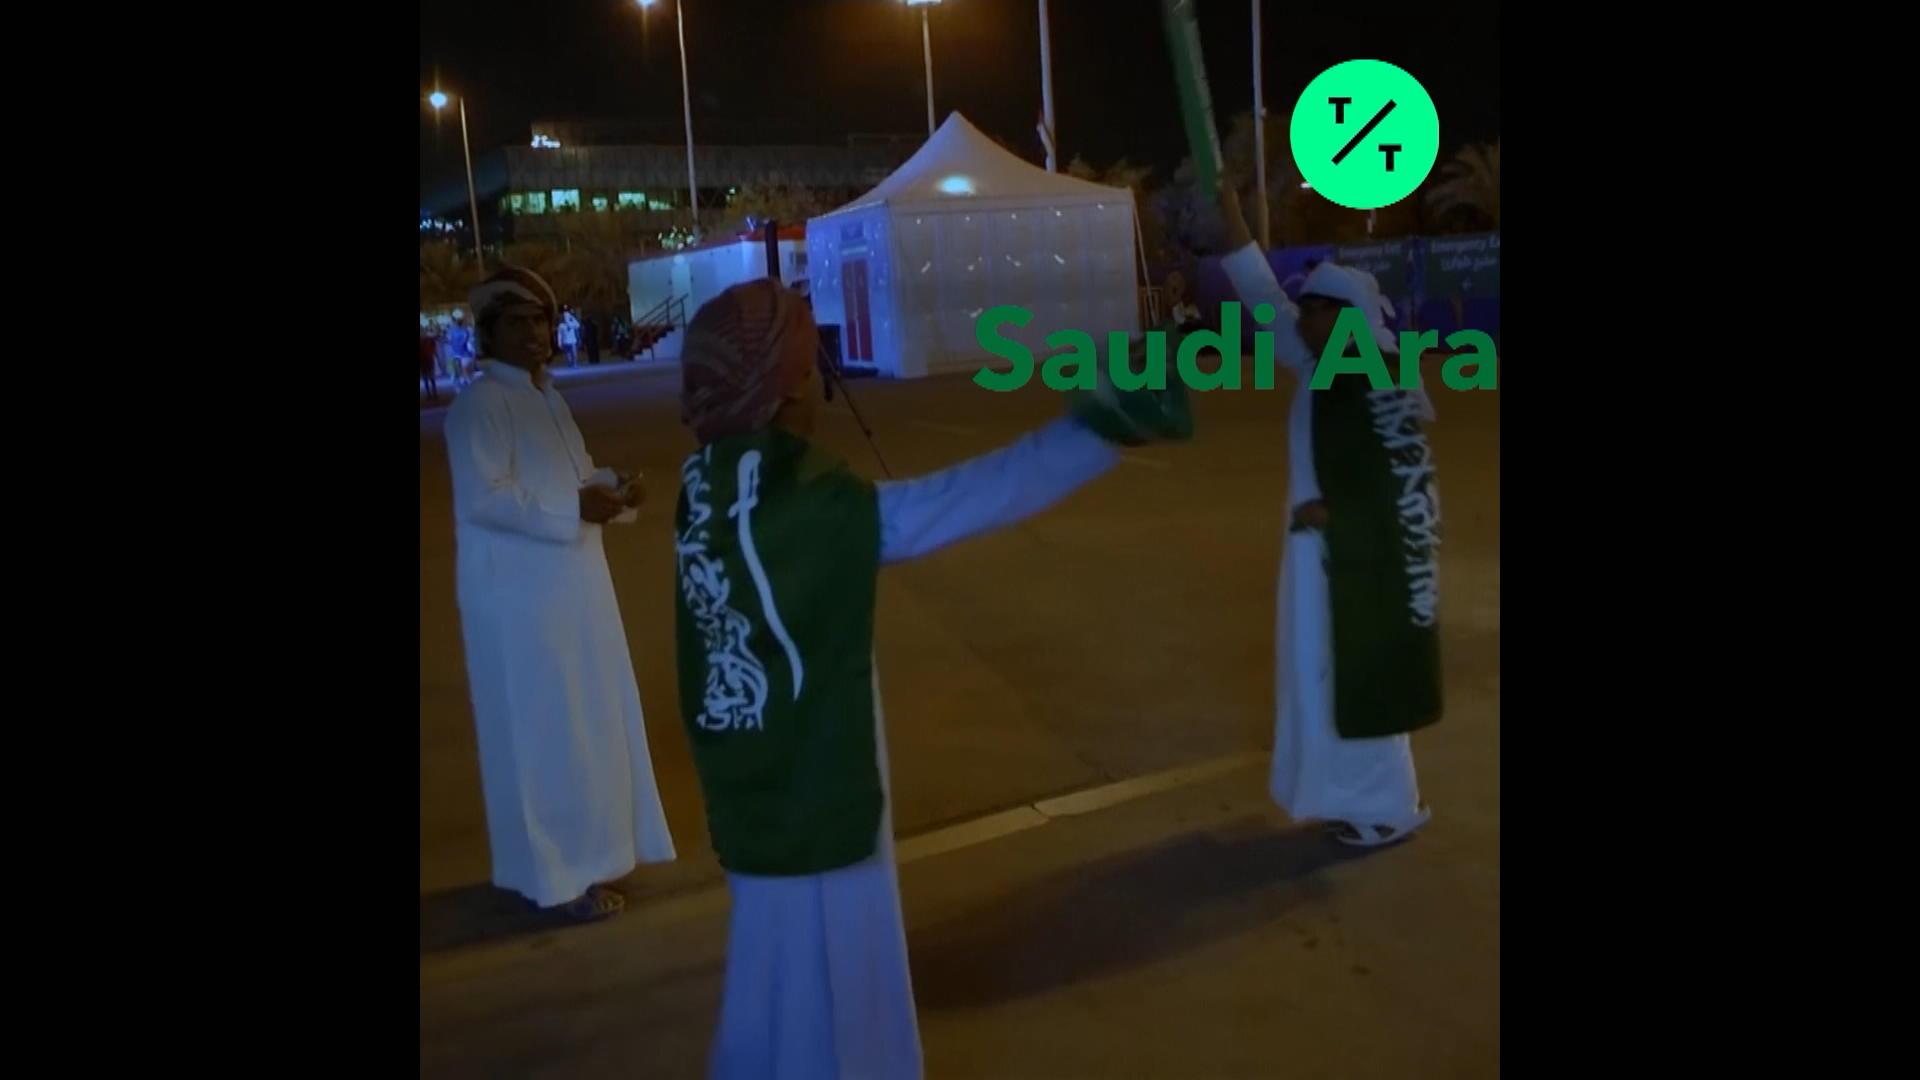 Saudi Arabia And Qatar Match In AFCC Amid Tensions